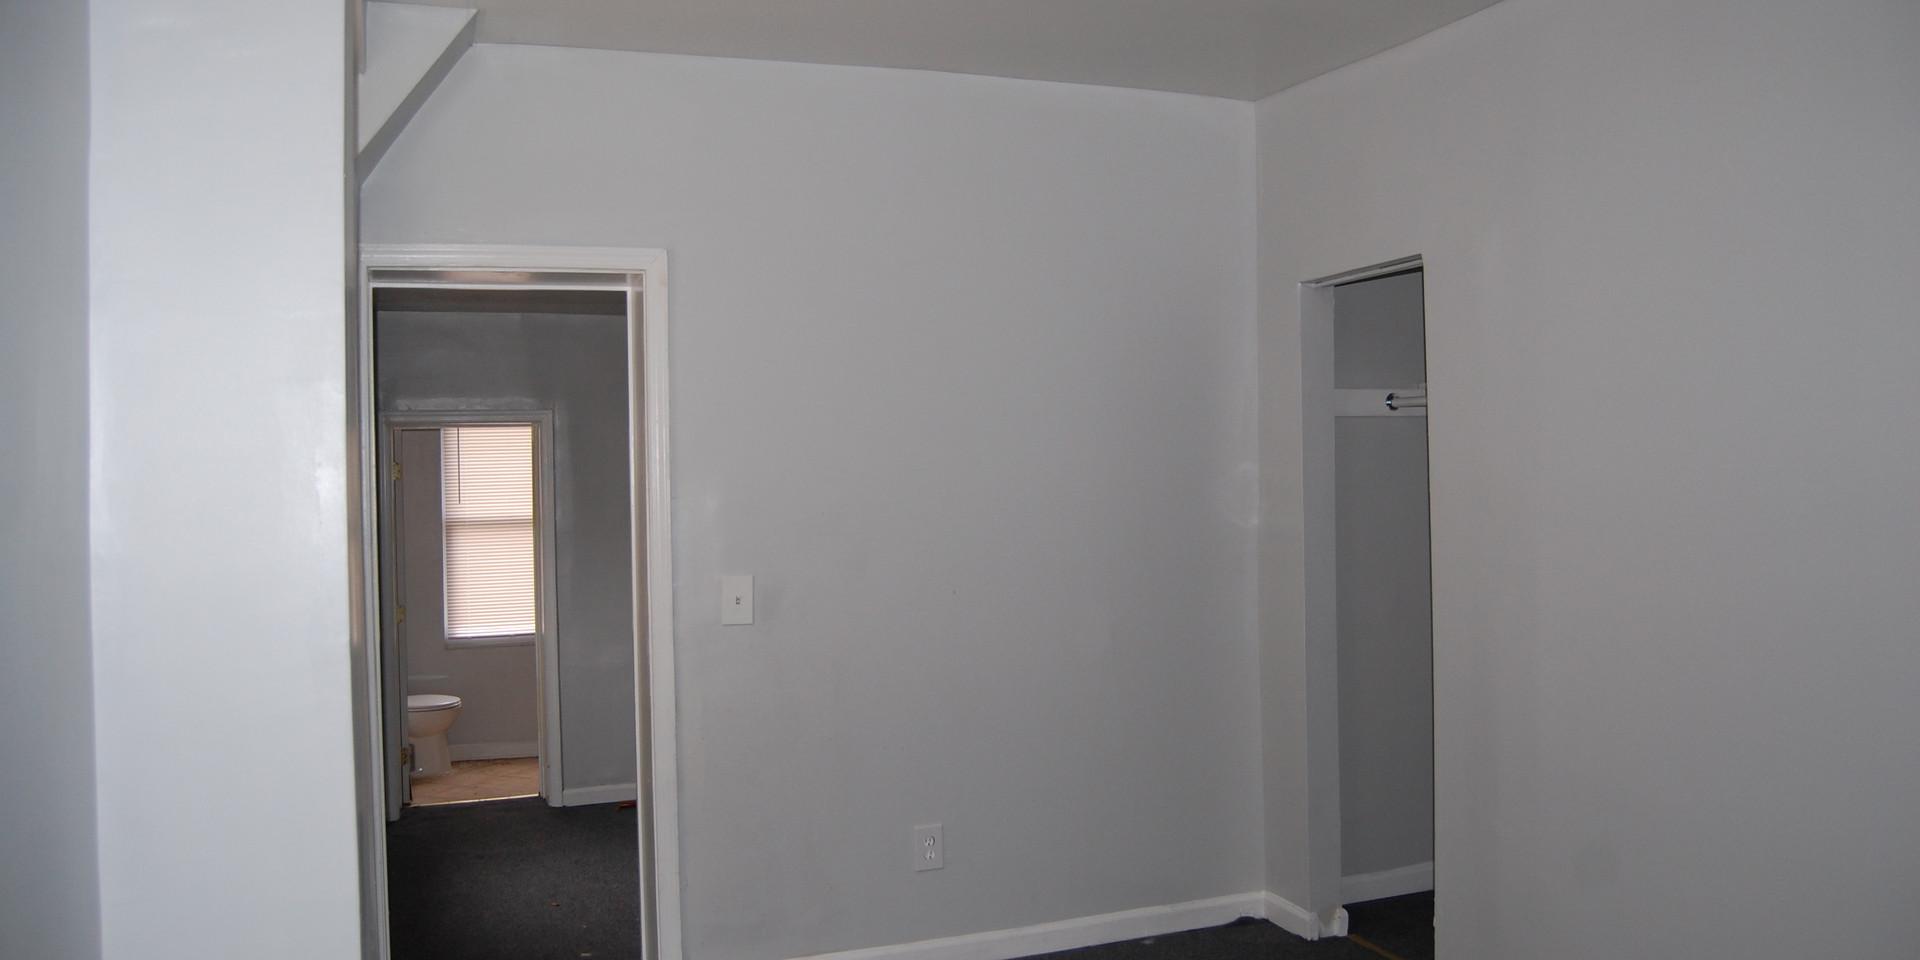 3.0 Second Bedroom.jpg